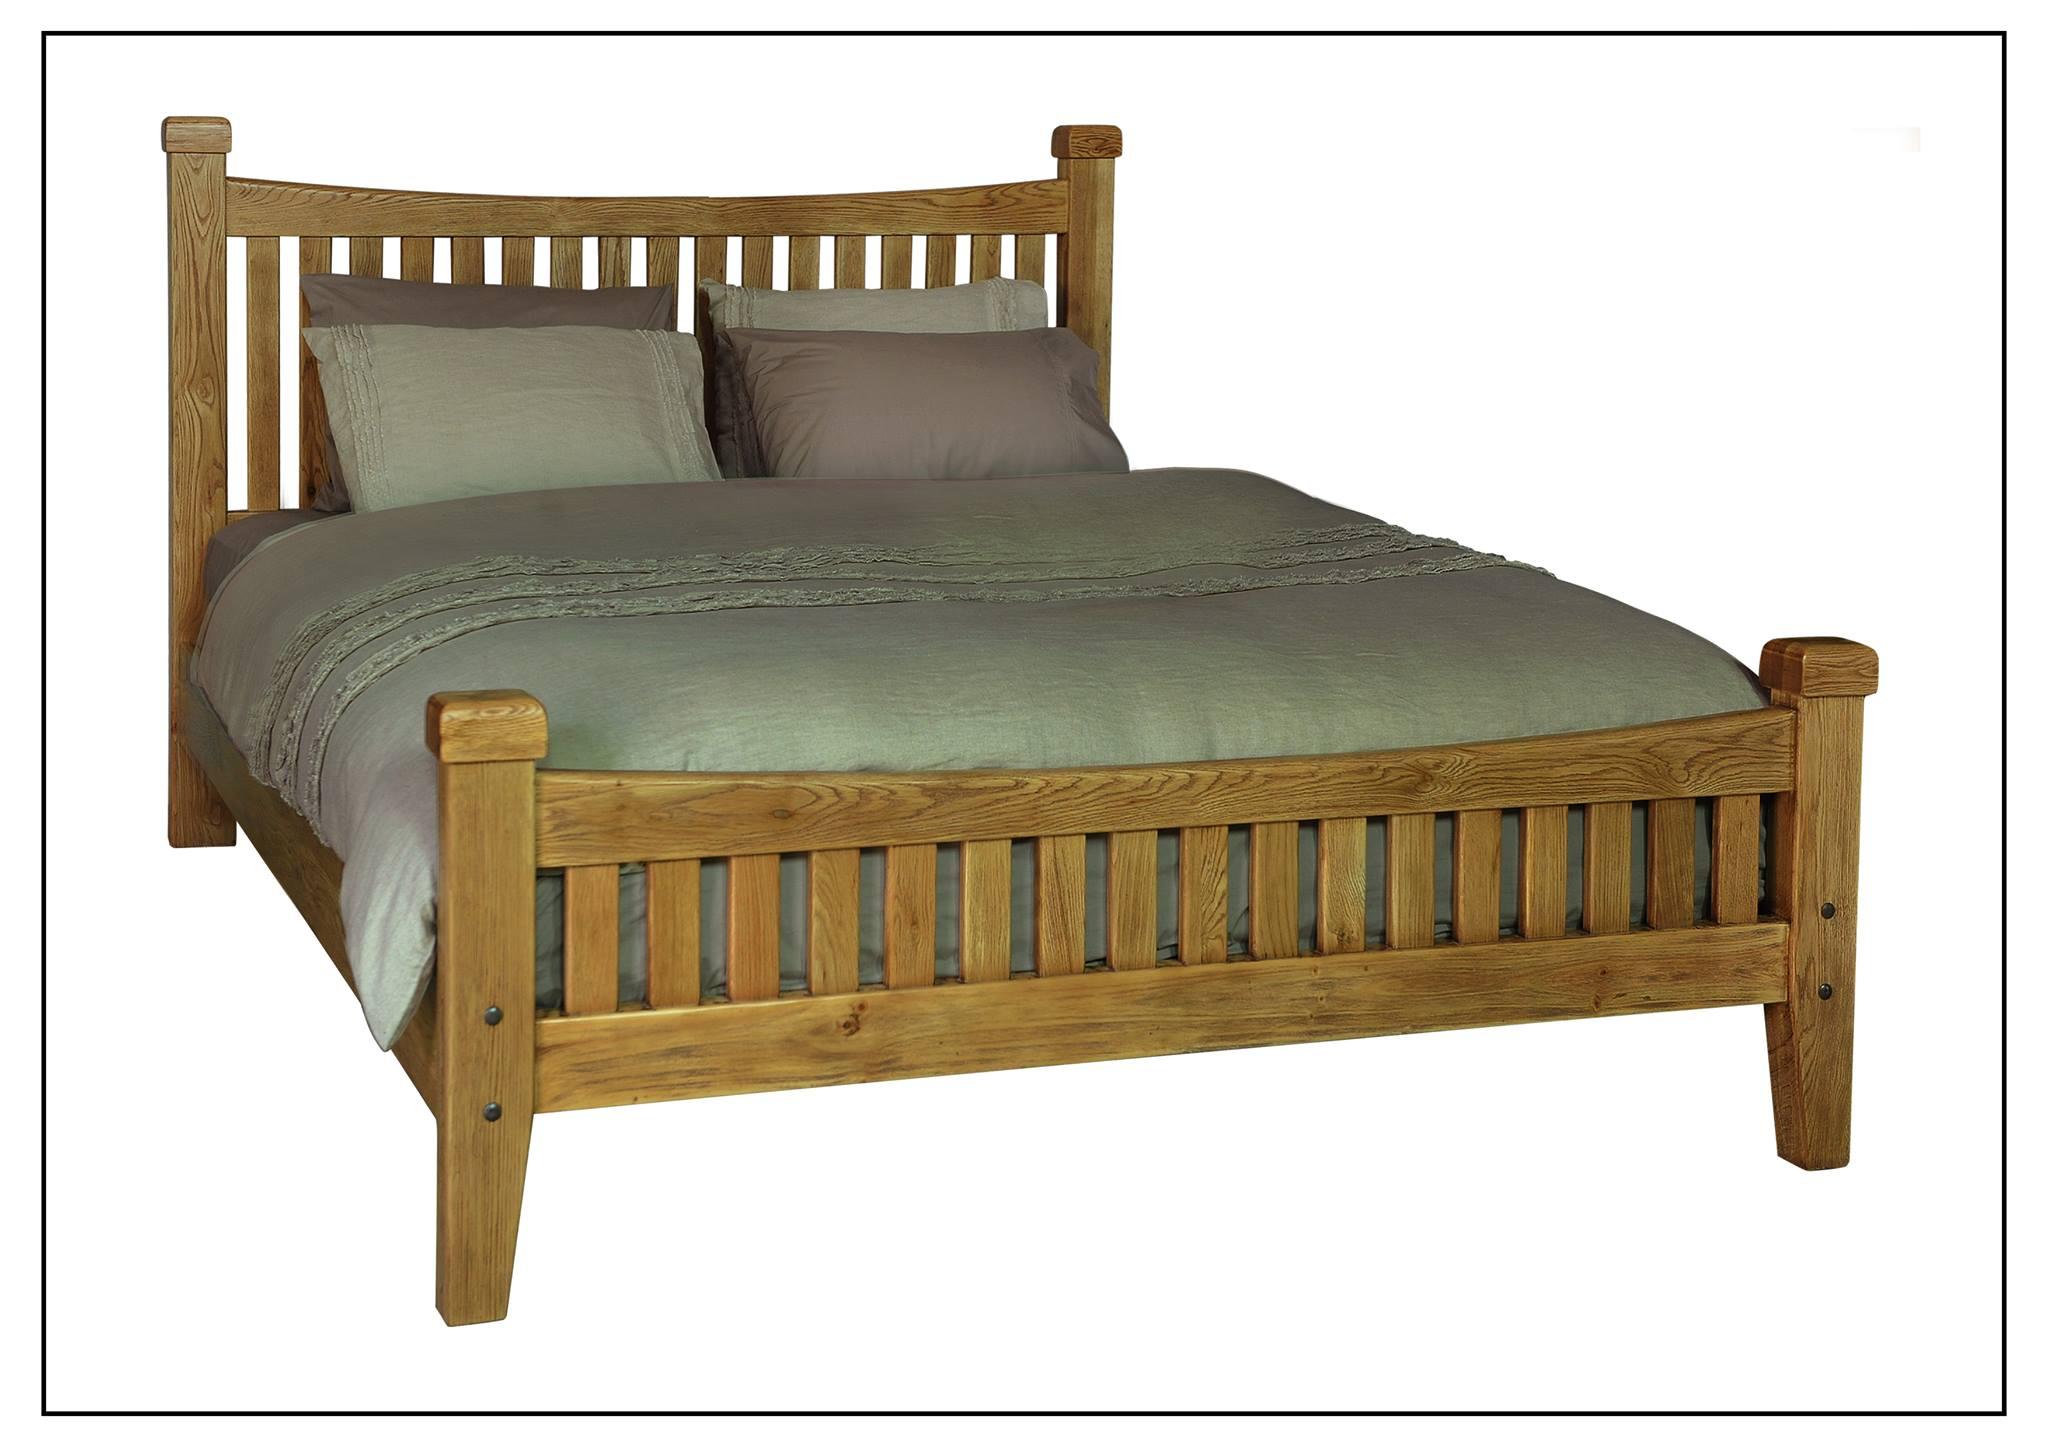 Rustic oak bedframe front detail